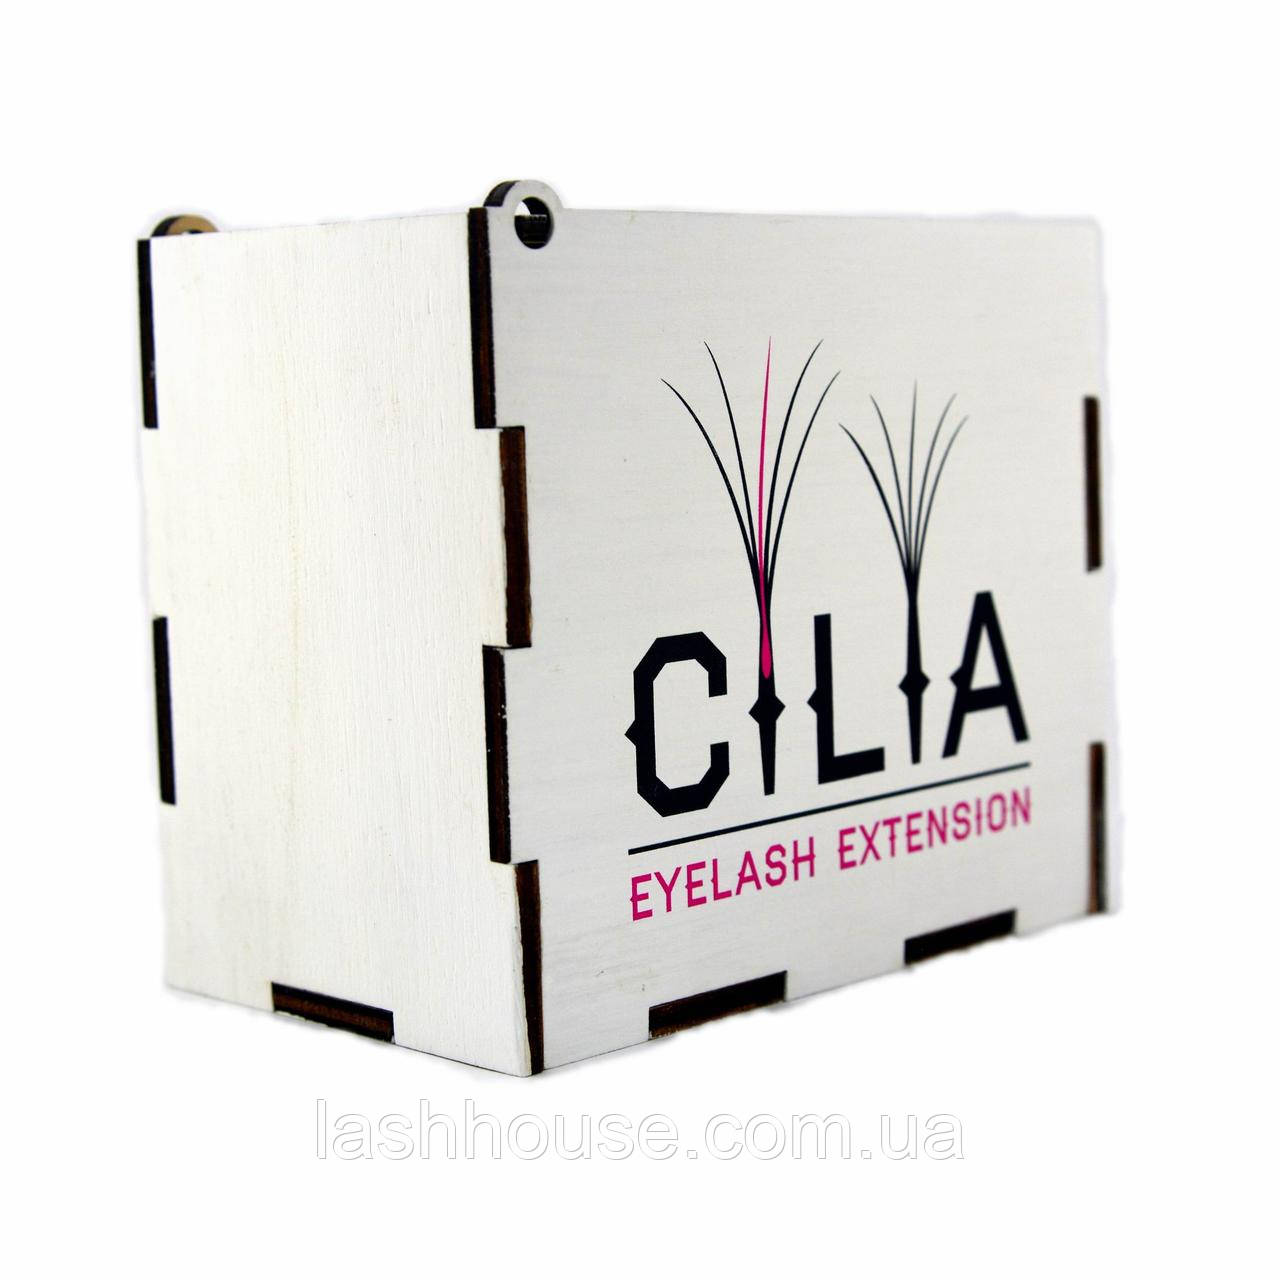 LashBox Для Ресниц Cilia [WHITE] (Лэшбокс С 5 Планшетками)